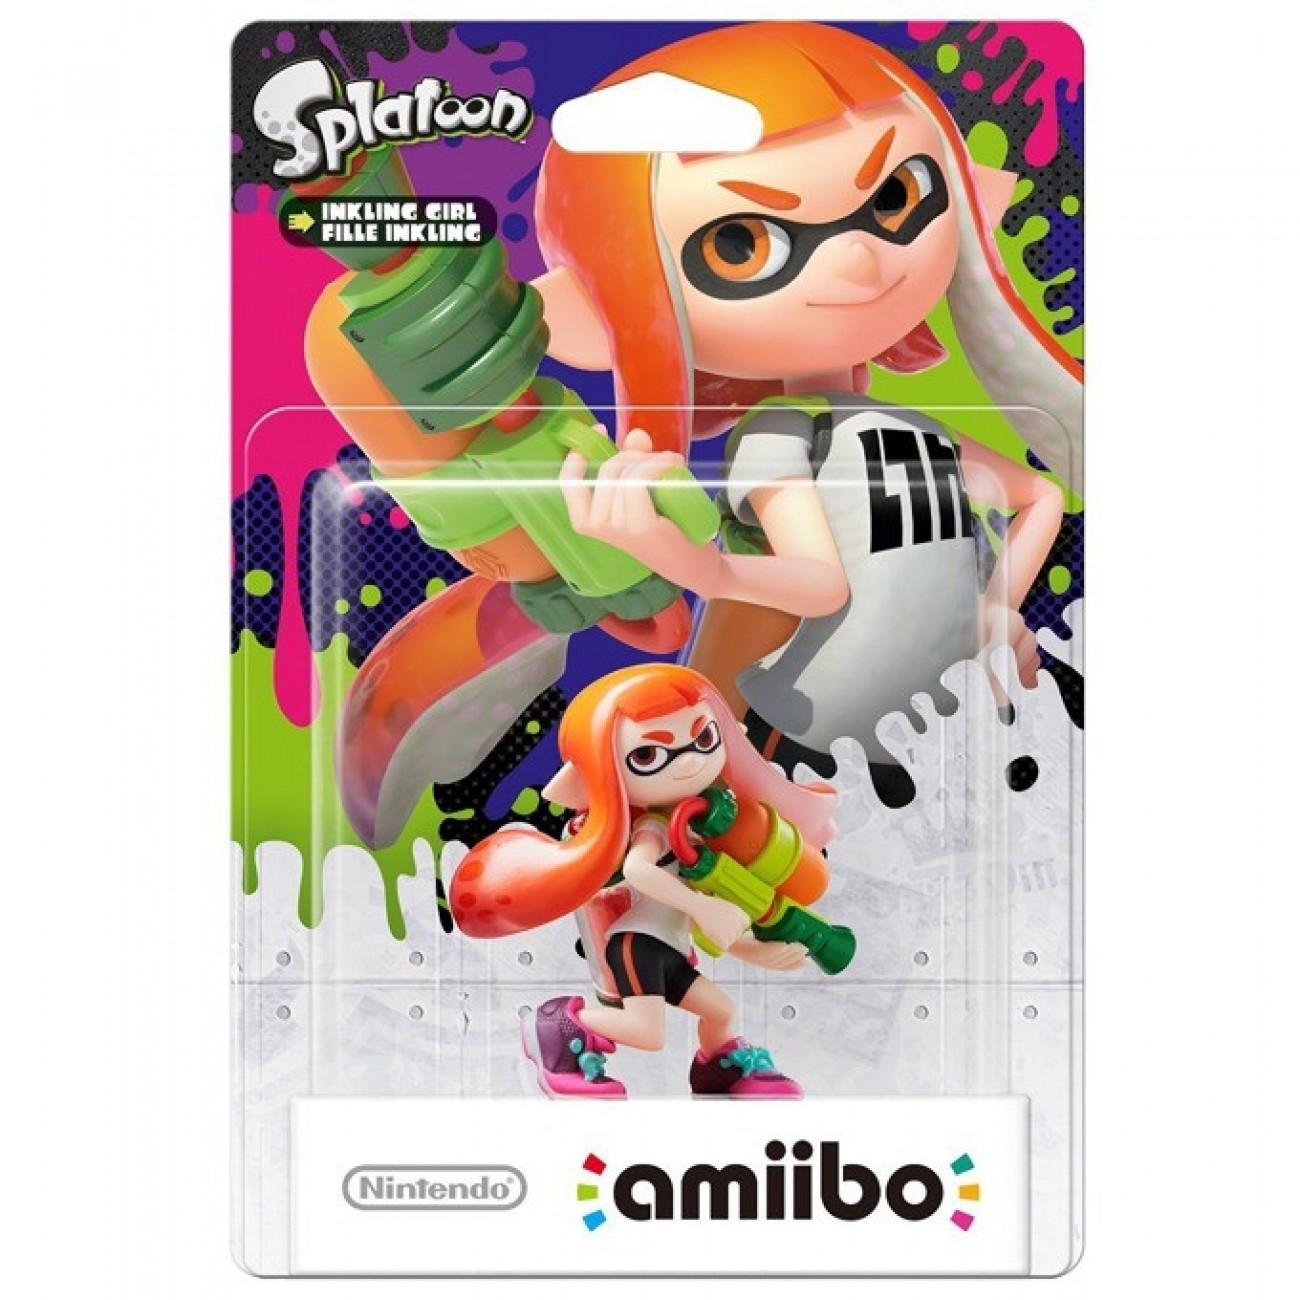 Nintendo Amiibo - Inkling Girl (Splatoon), за Nintendo 3DS/2DS, Wii U в Аксесоари за Конзоли -  | Alleop